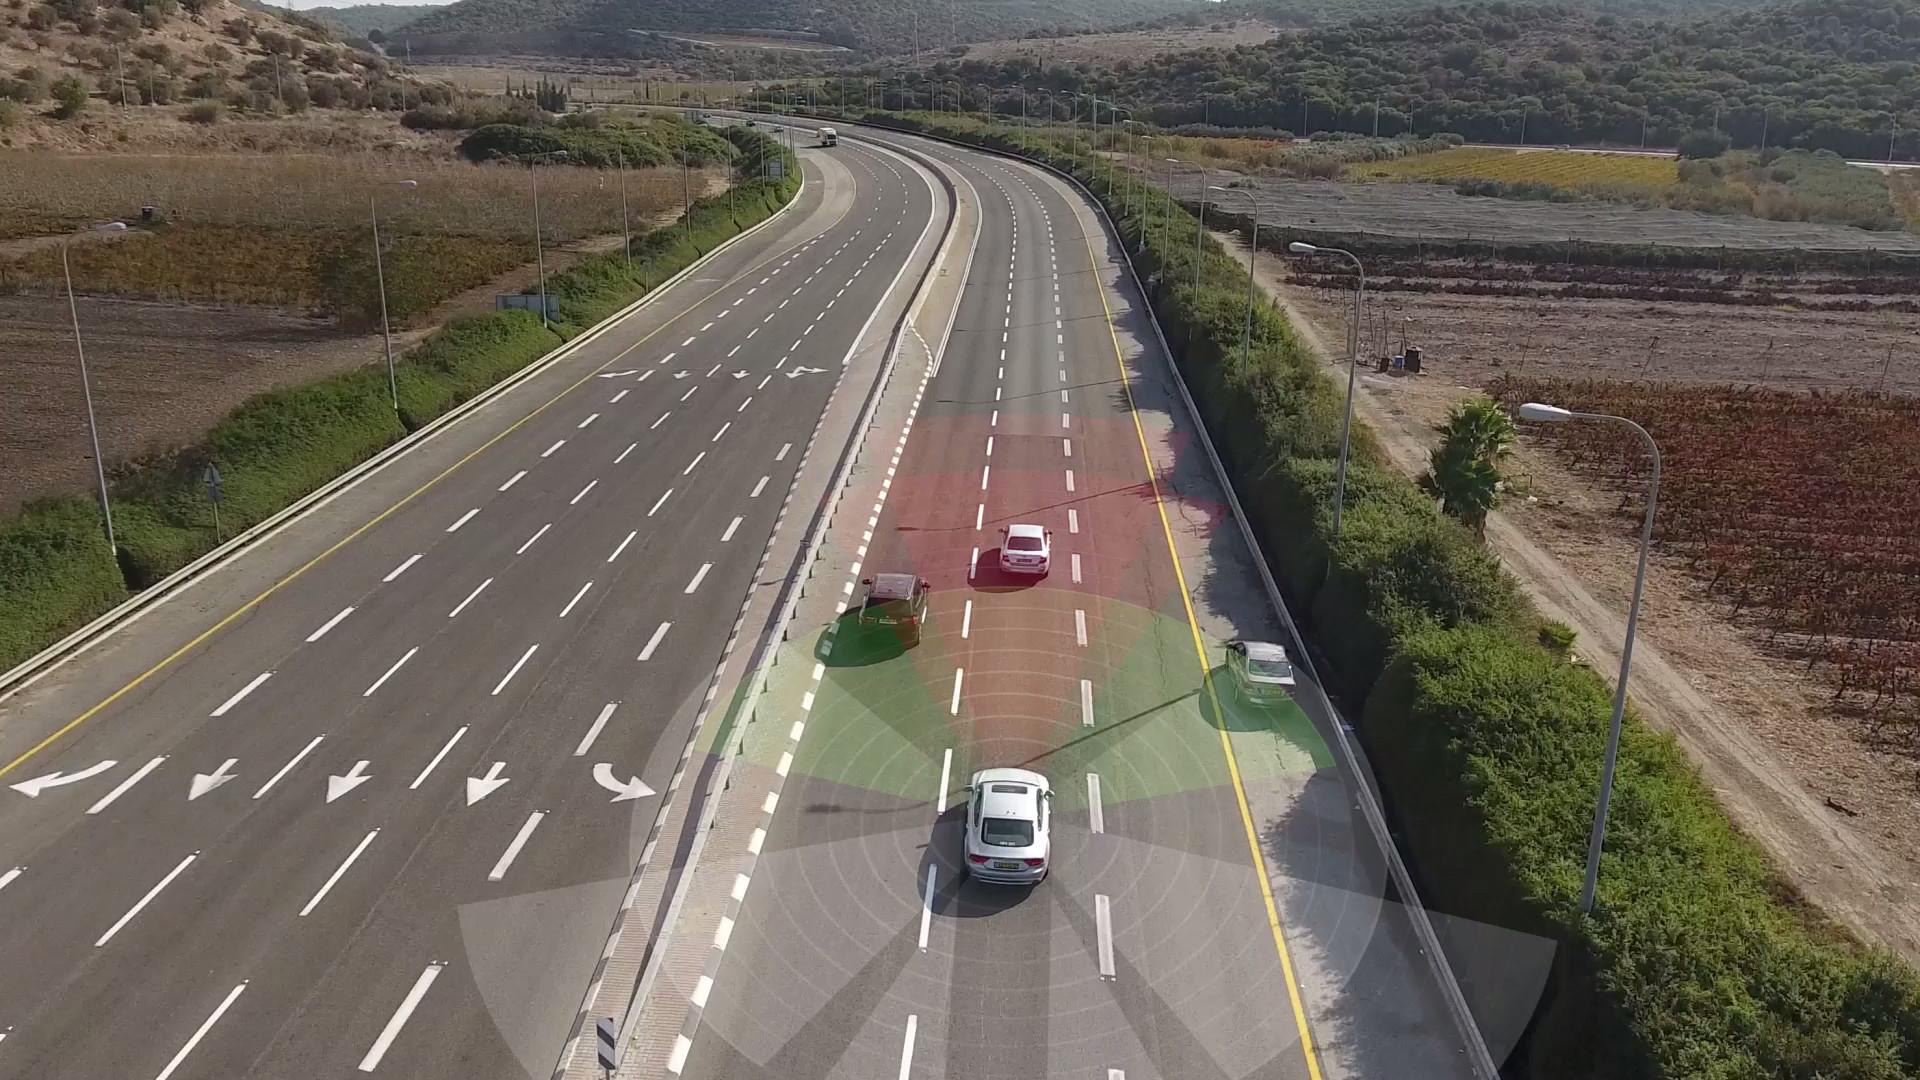 Visualization of autonomous vehicle sensing the environment